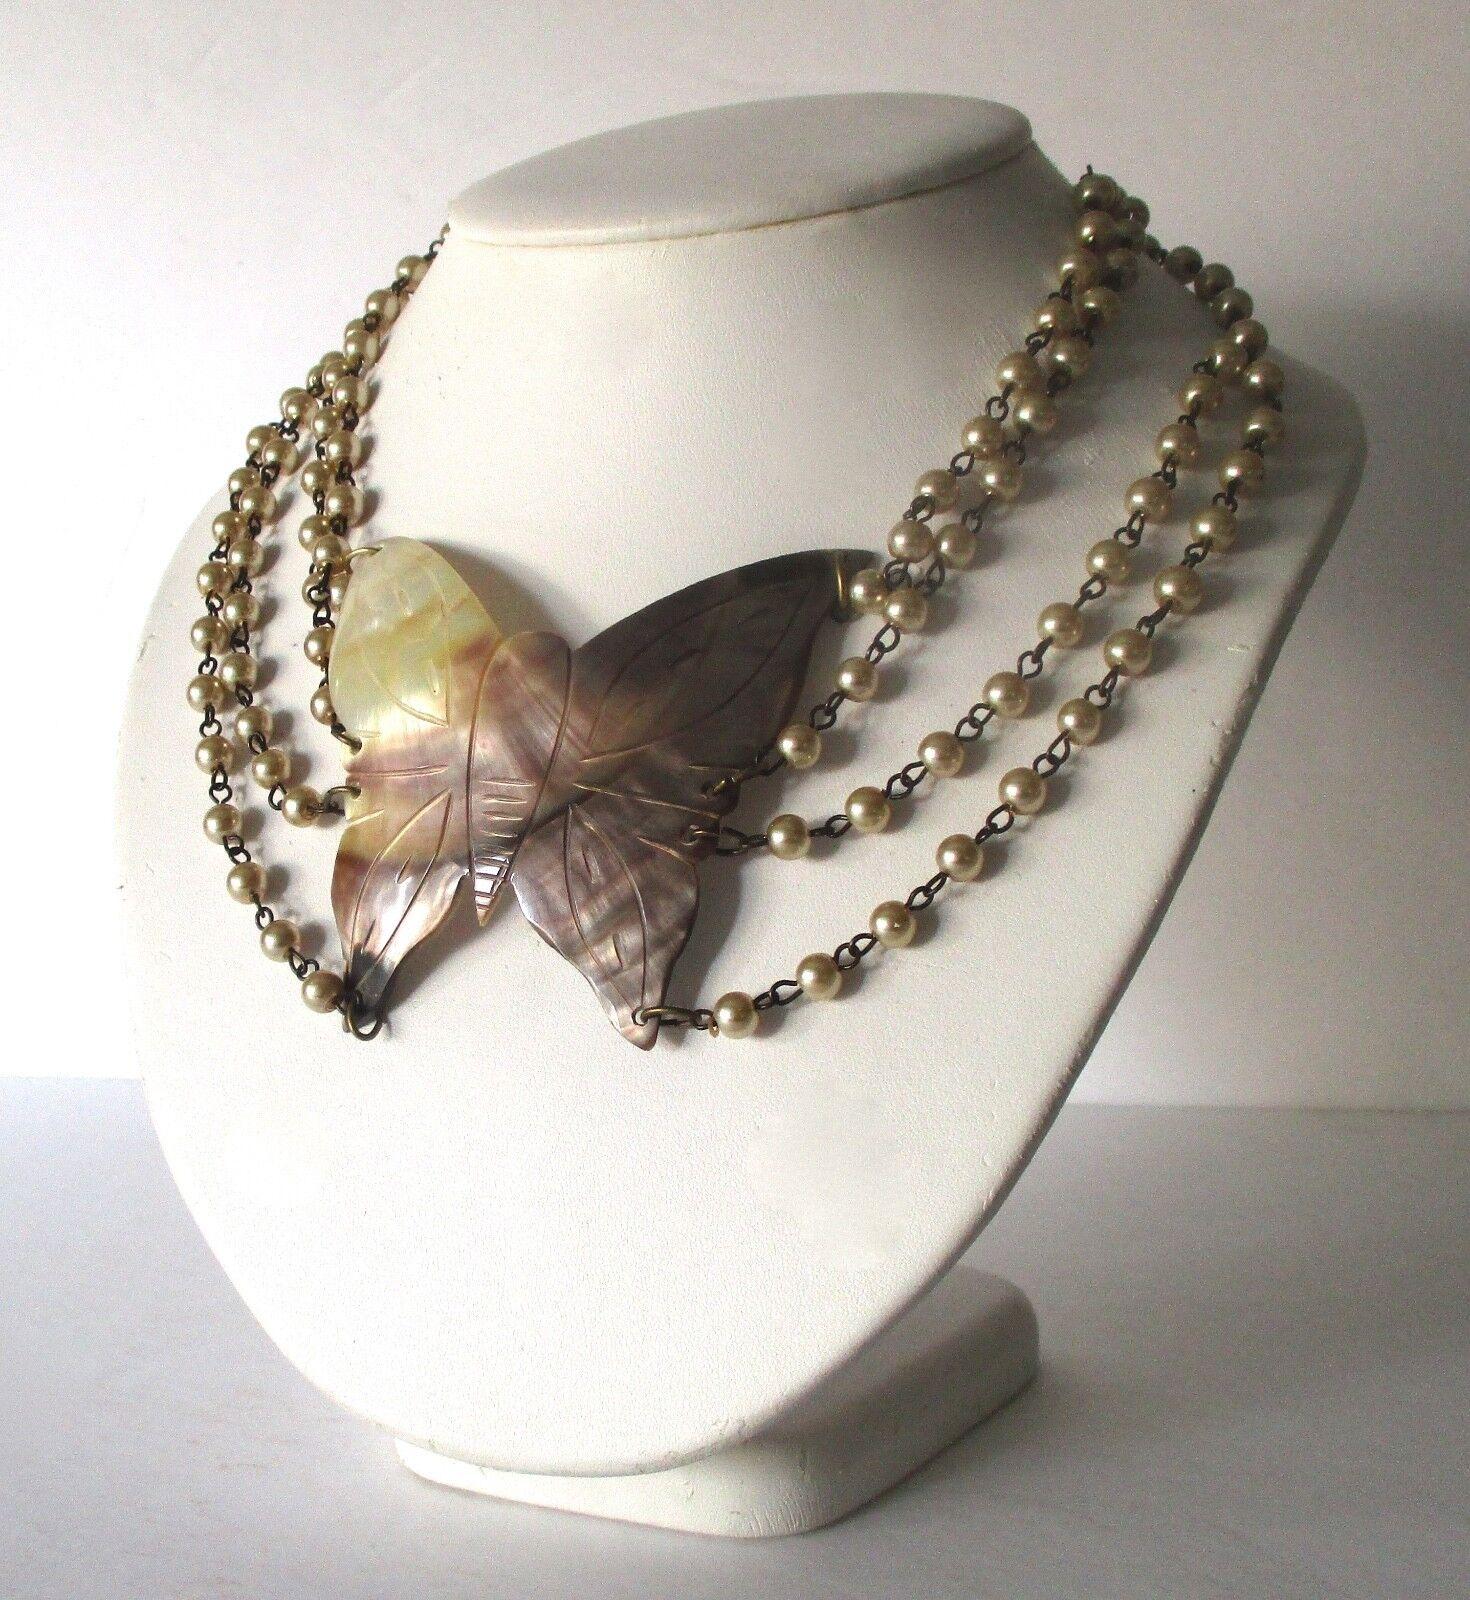 Set Mother of Pearl Vintage Handcrafted Boho Hippie 45.1 g 25 g 925 Sterling Silver Necklace and Bracelet BELDIAMO